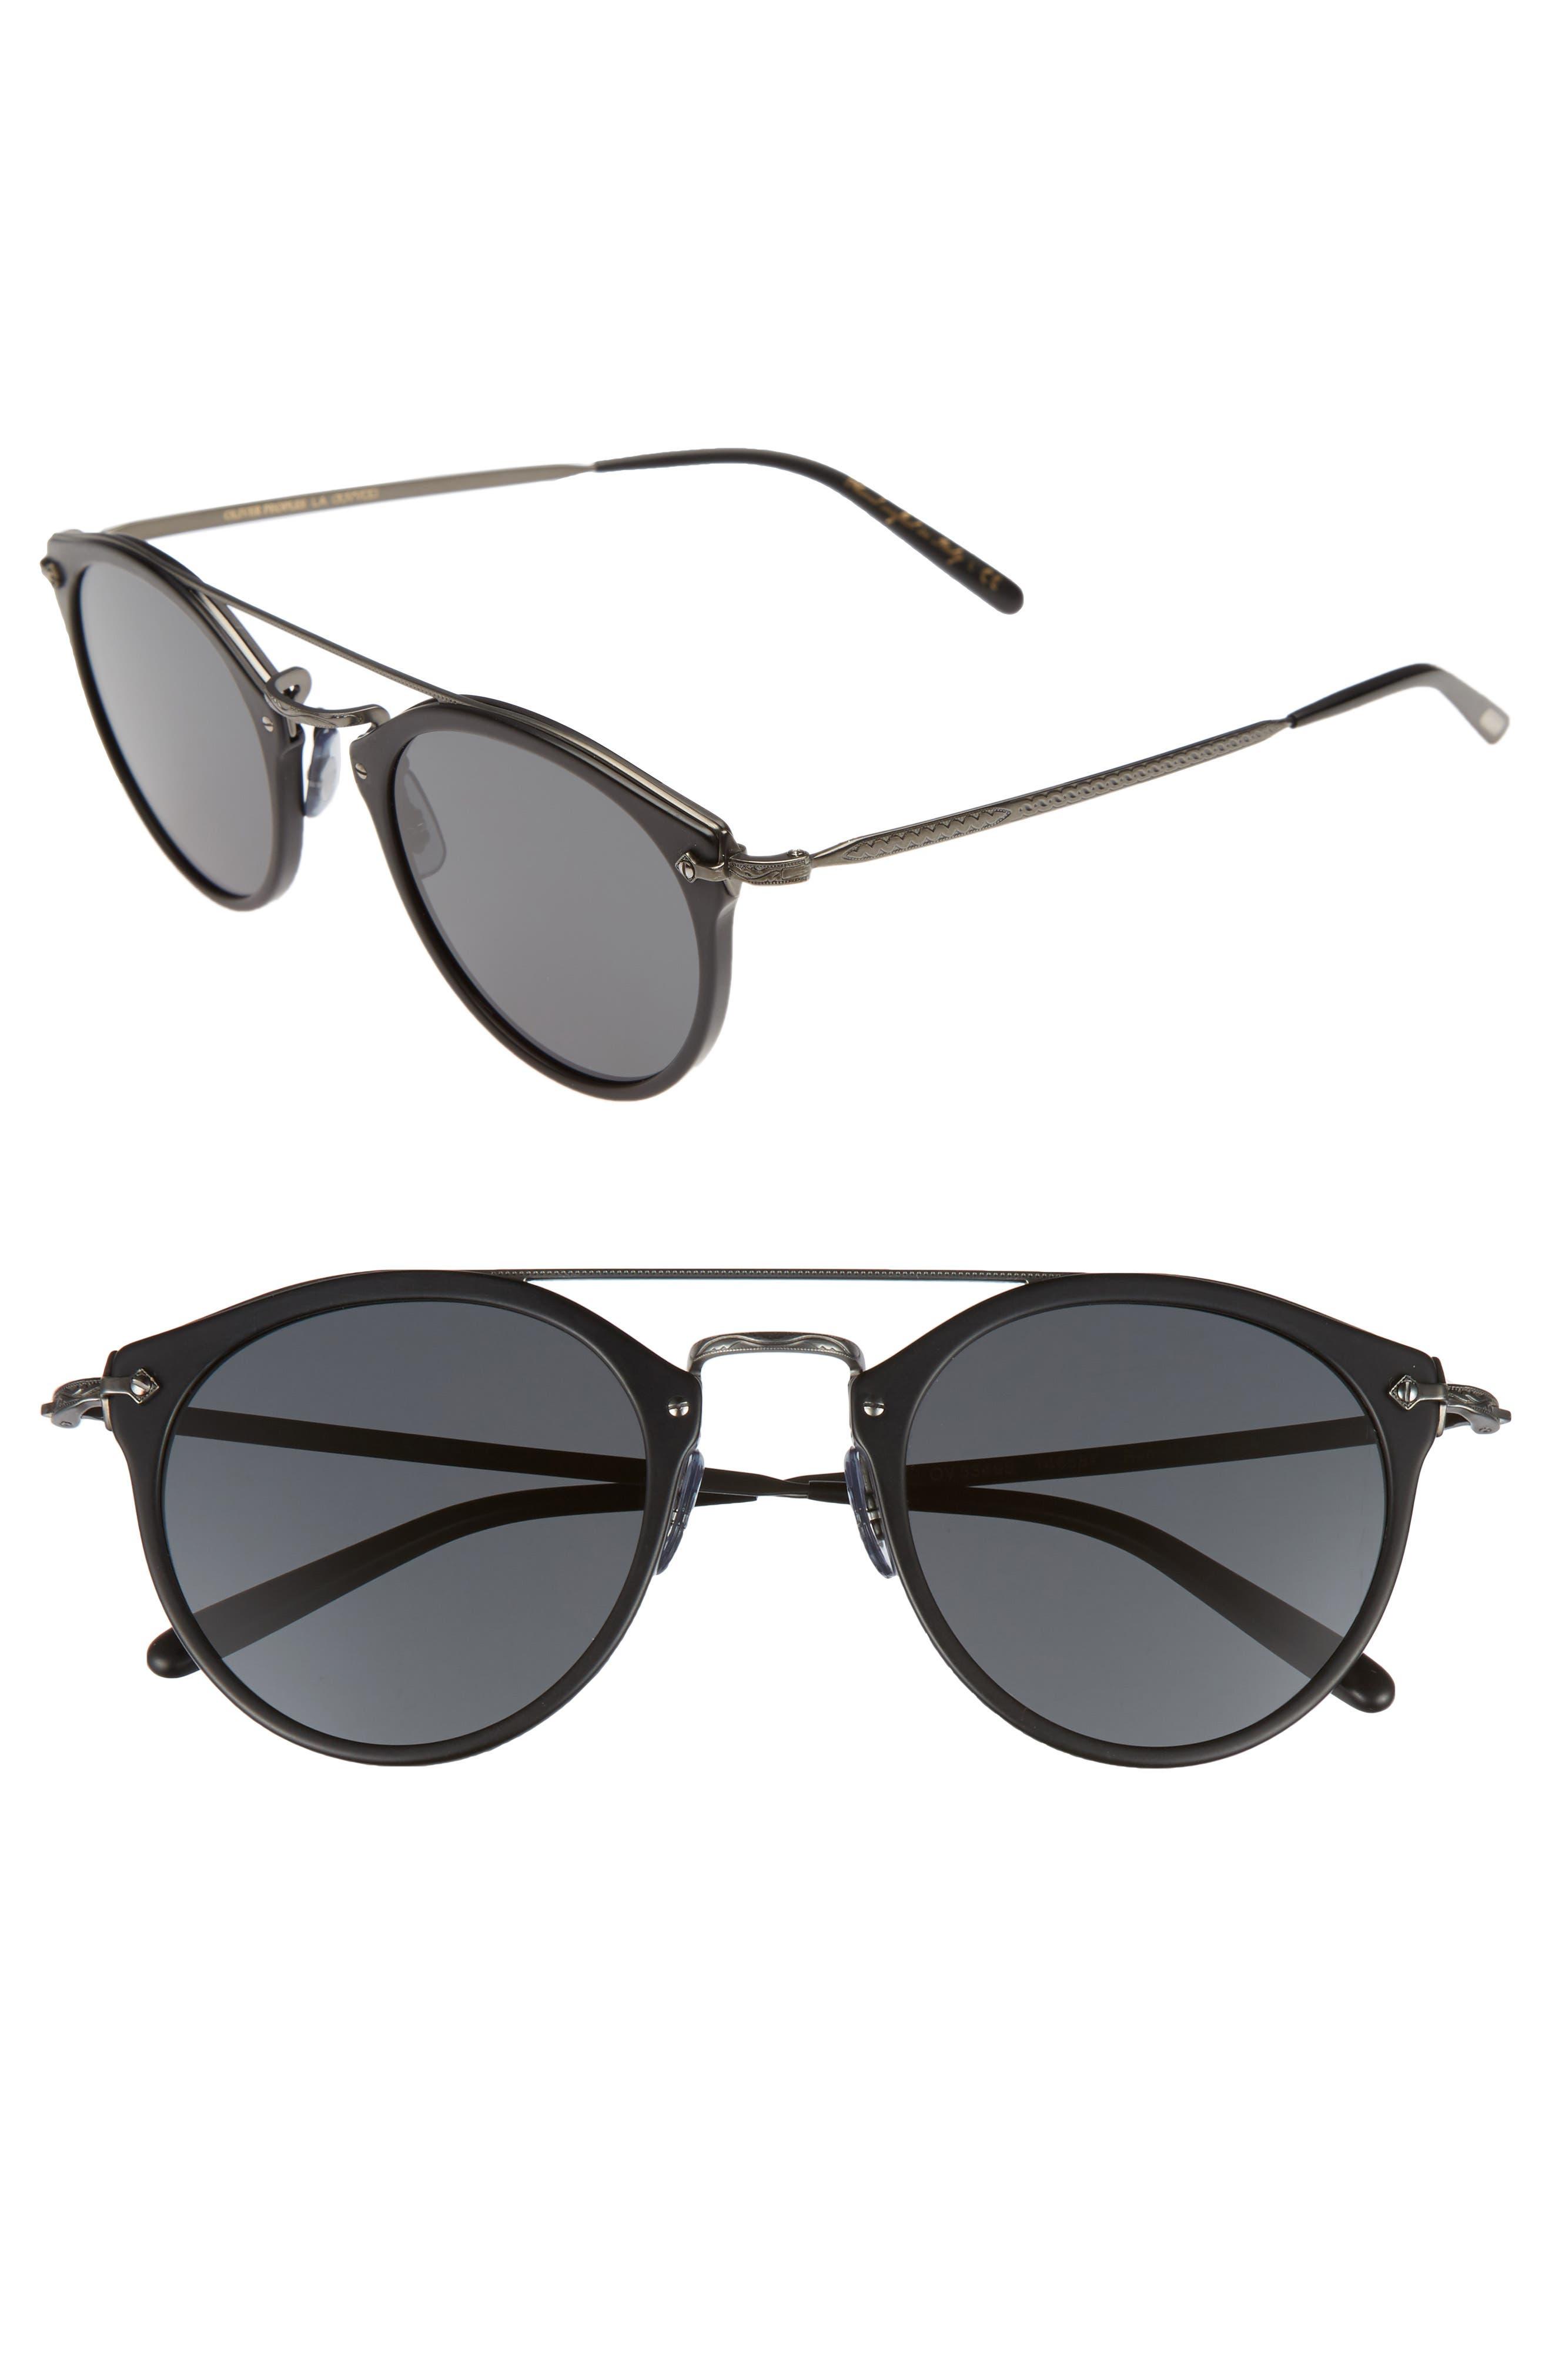 Remick 50mm Sunglasses,                         Main,                         color, 001